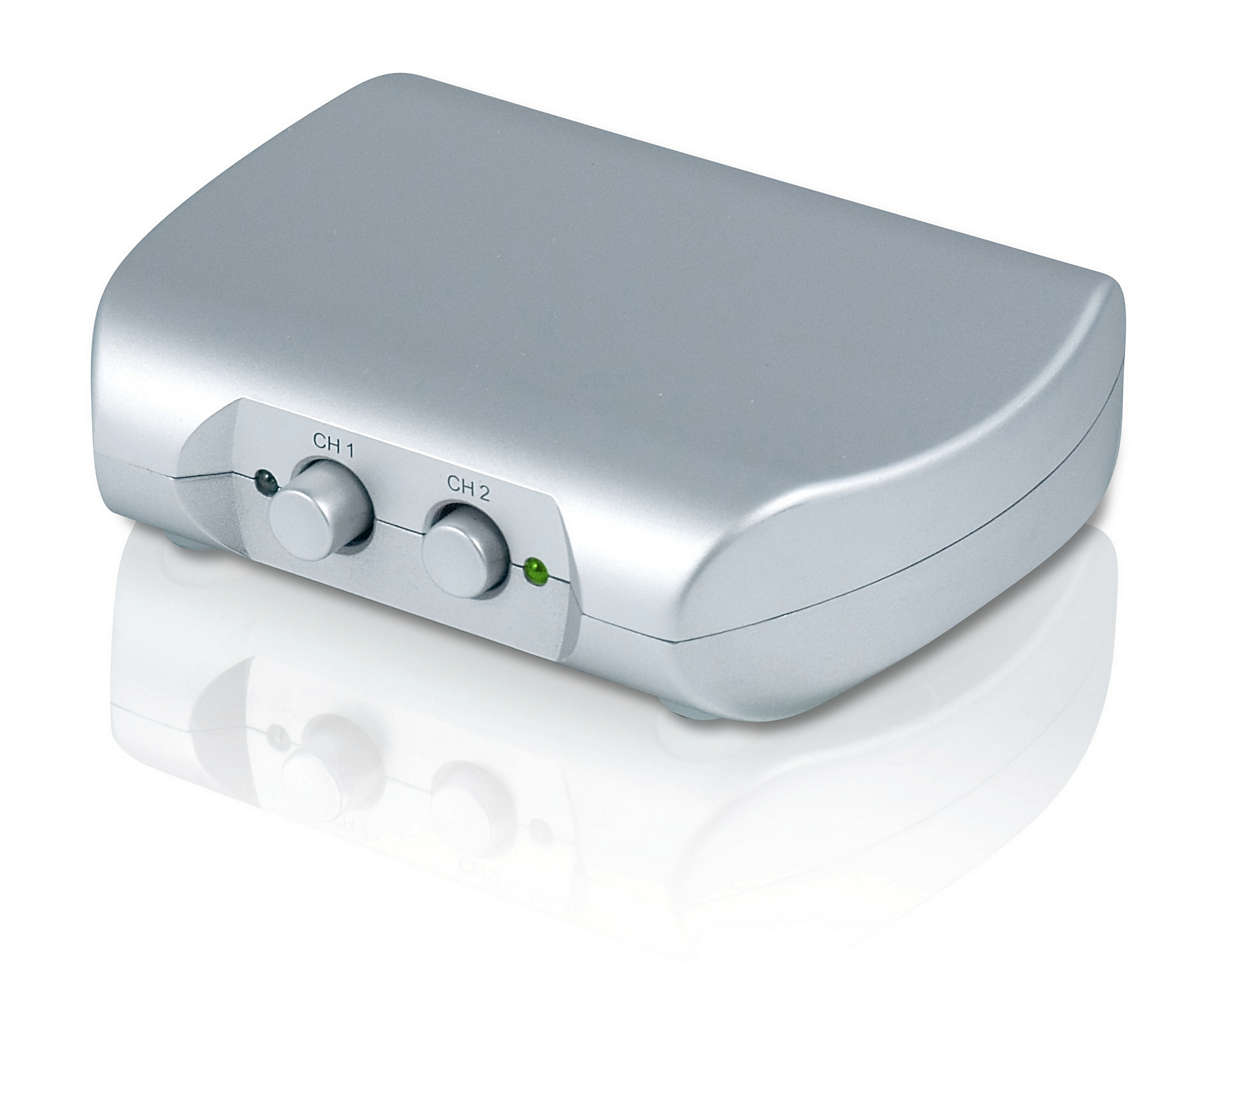 Veksle mellom 2 HDMI-kilder